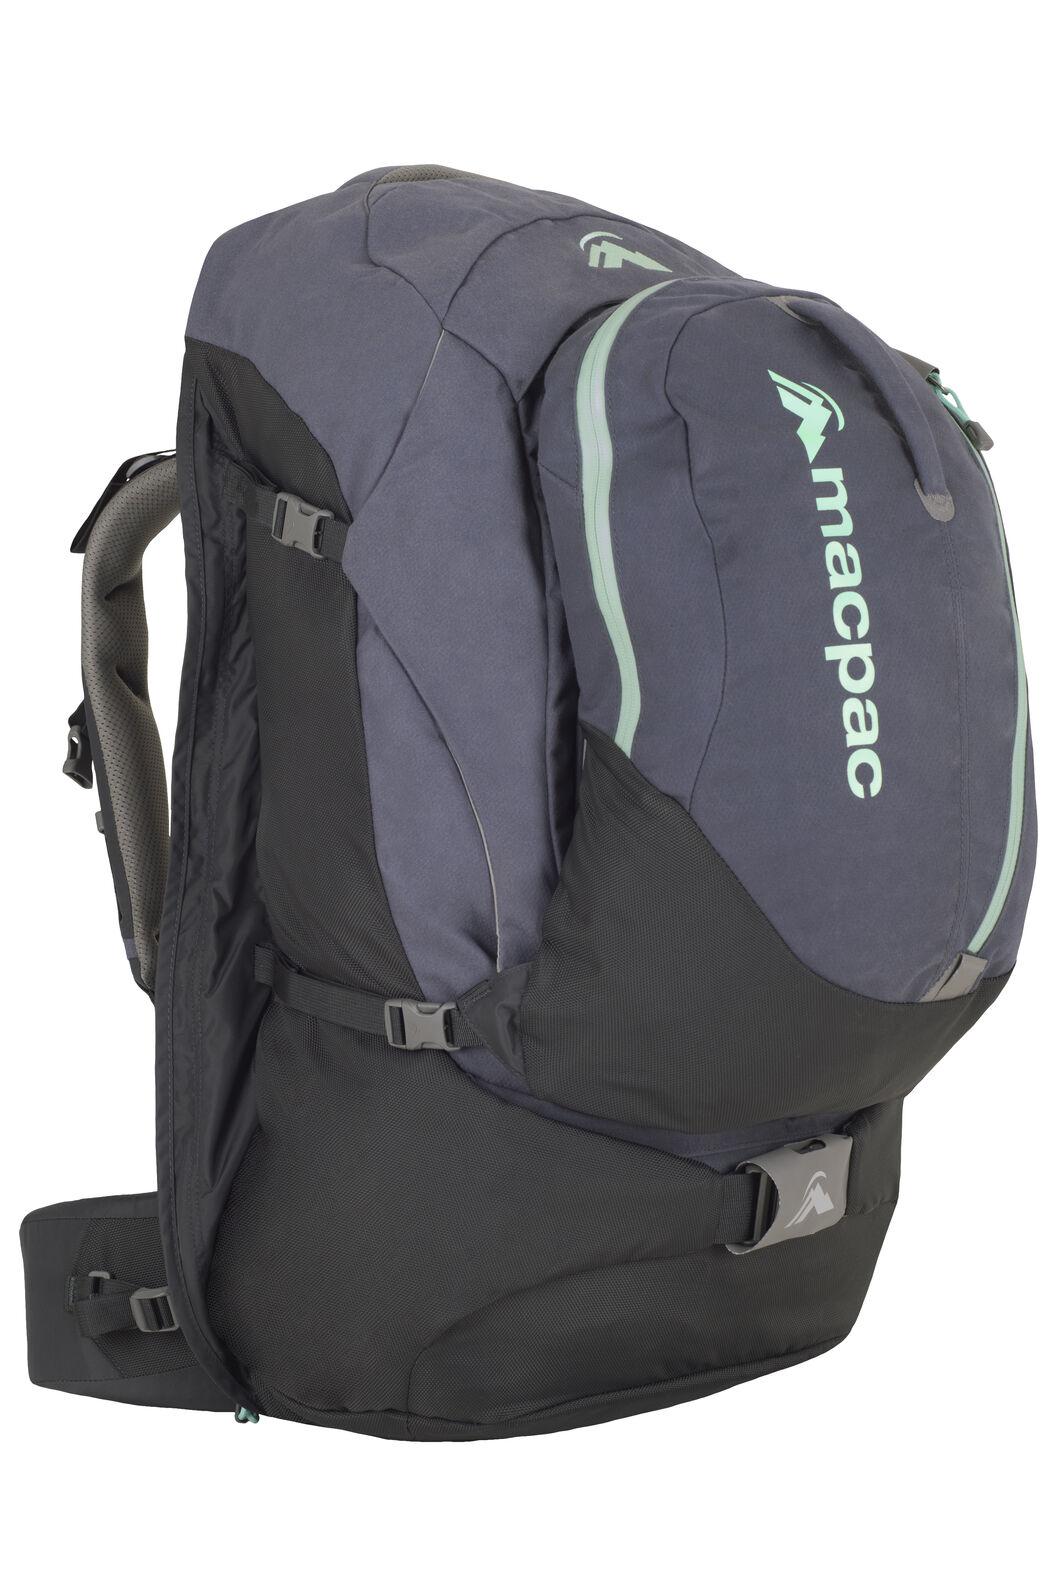 Macpac Gemini AzTec® 75L Travel Backpack, Slate, hi-res